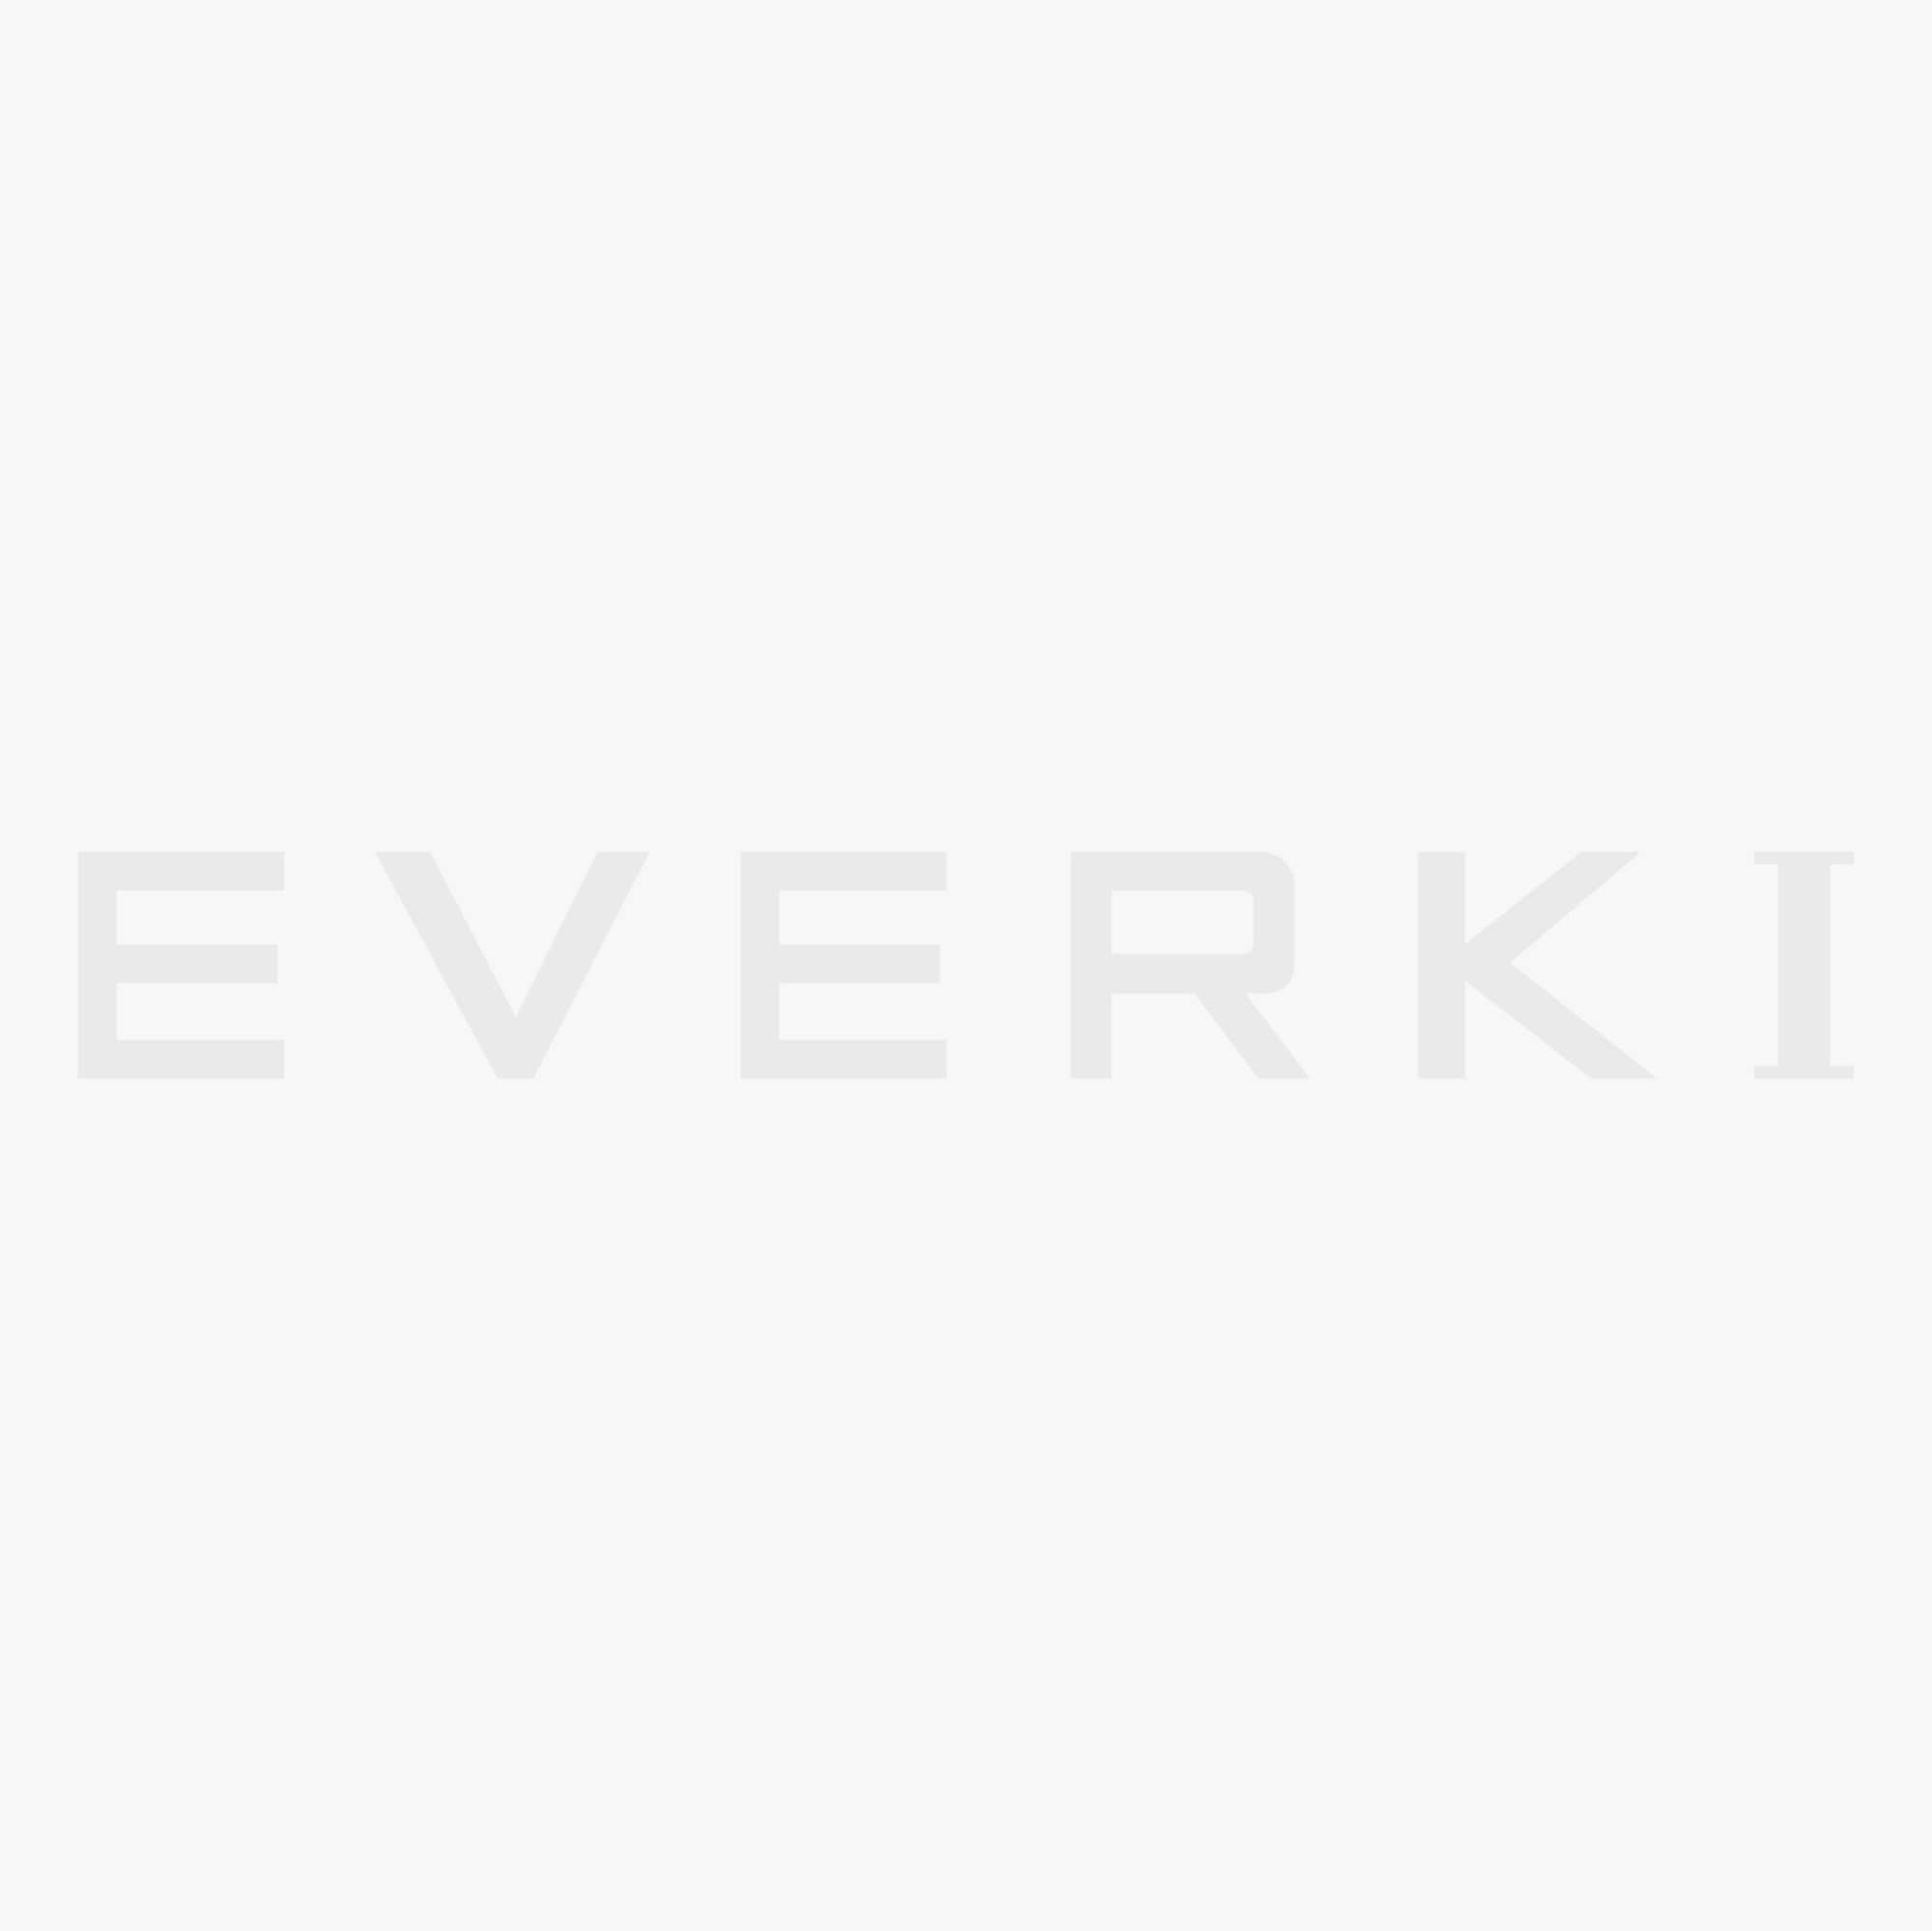 EVERKI Concept 2 Travel Friendly 17 Inch Laptop Backpack